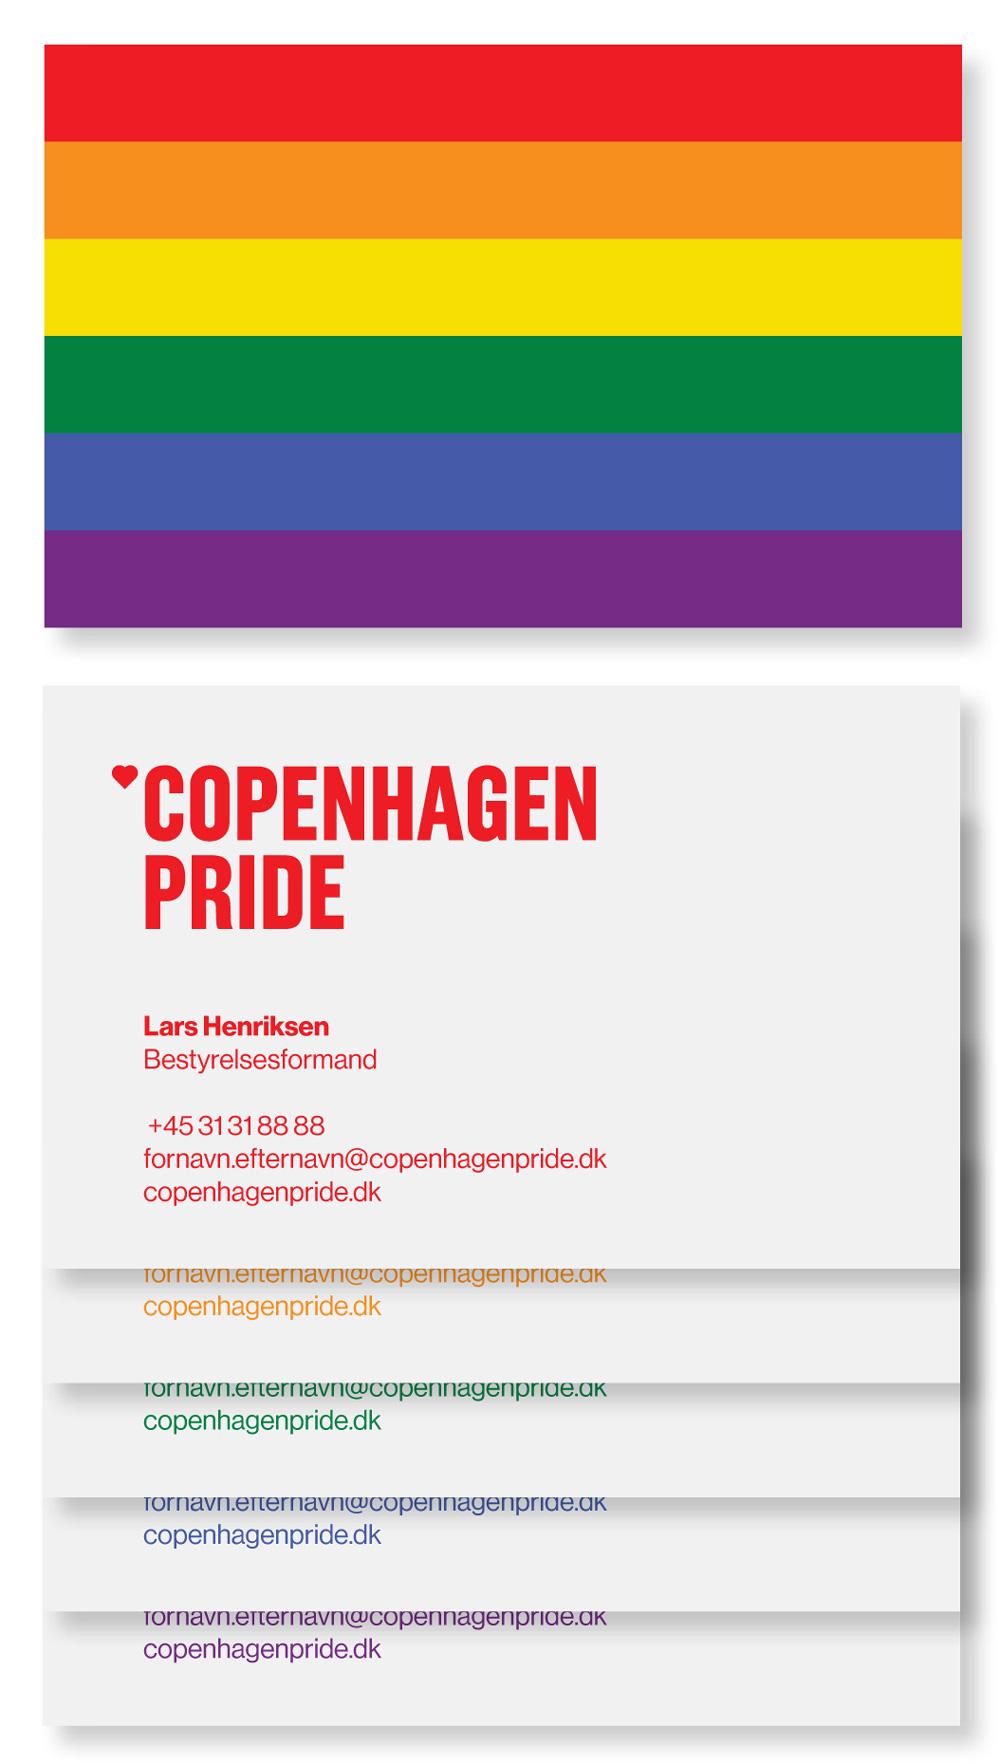 copenhagen_pride_business_cards